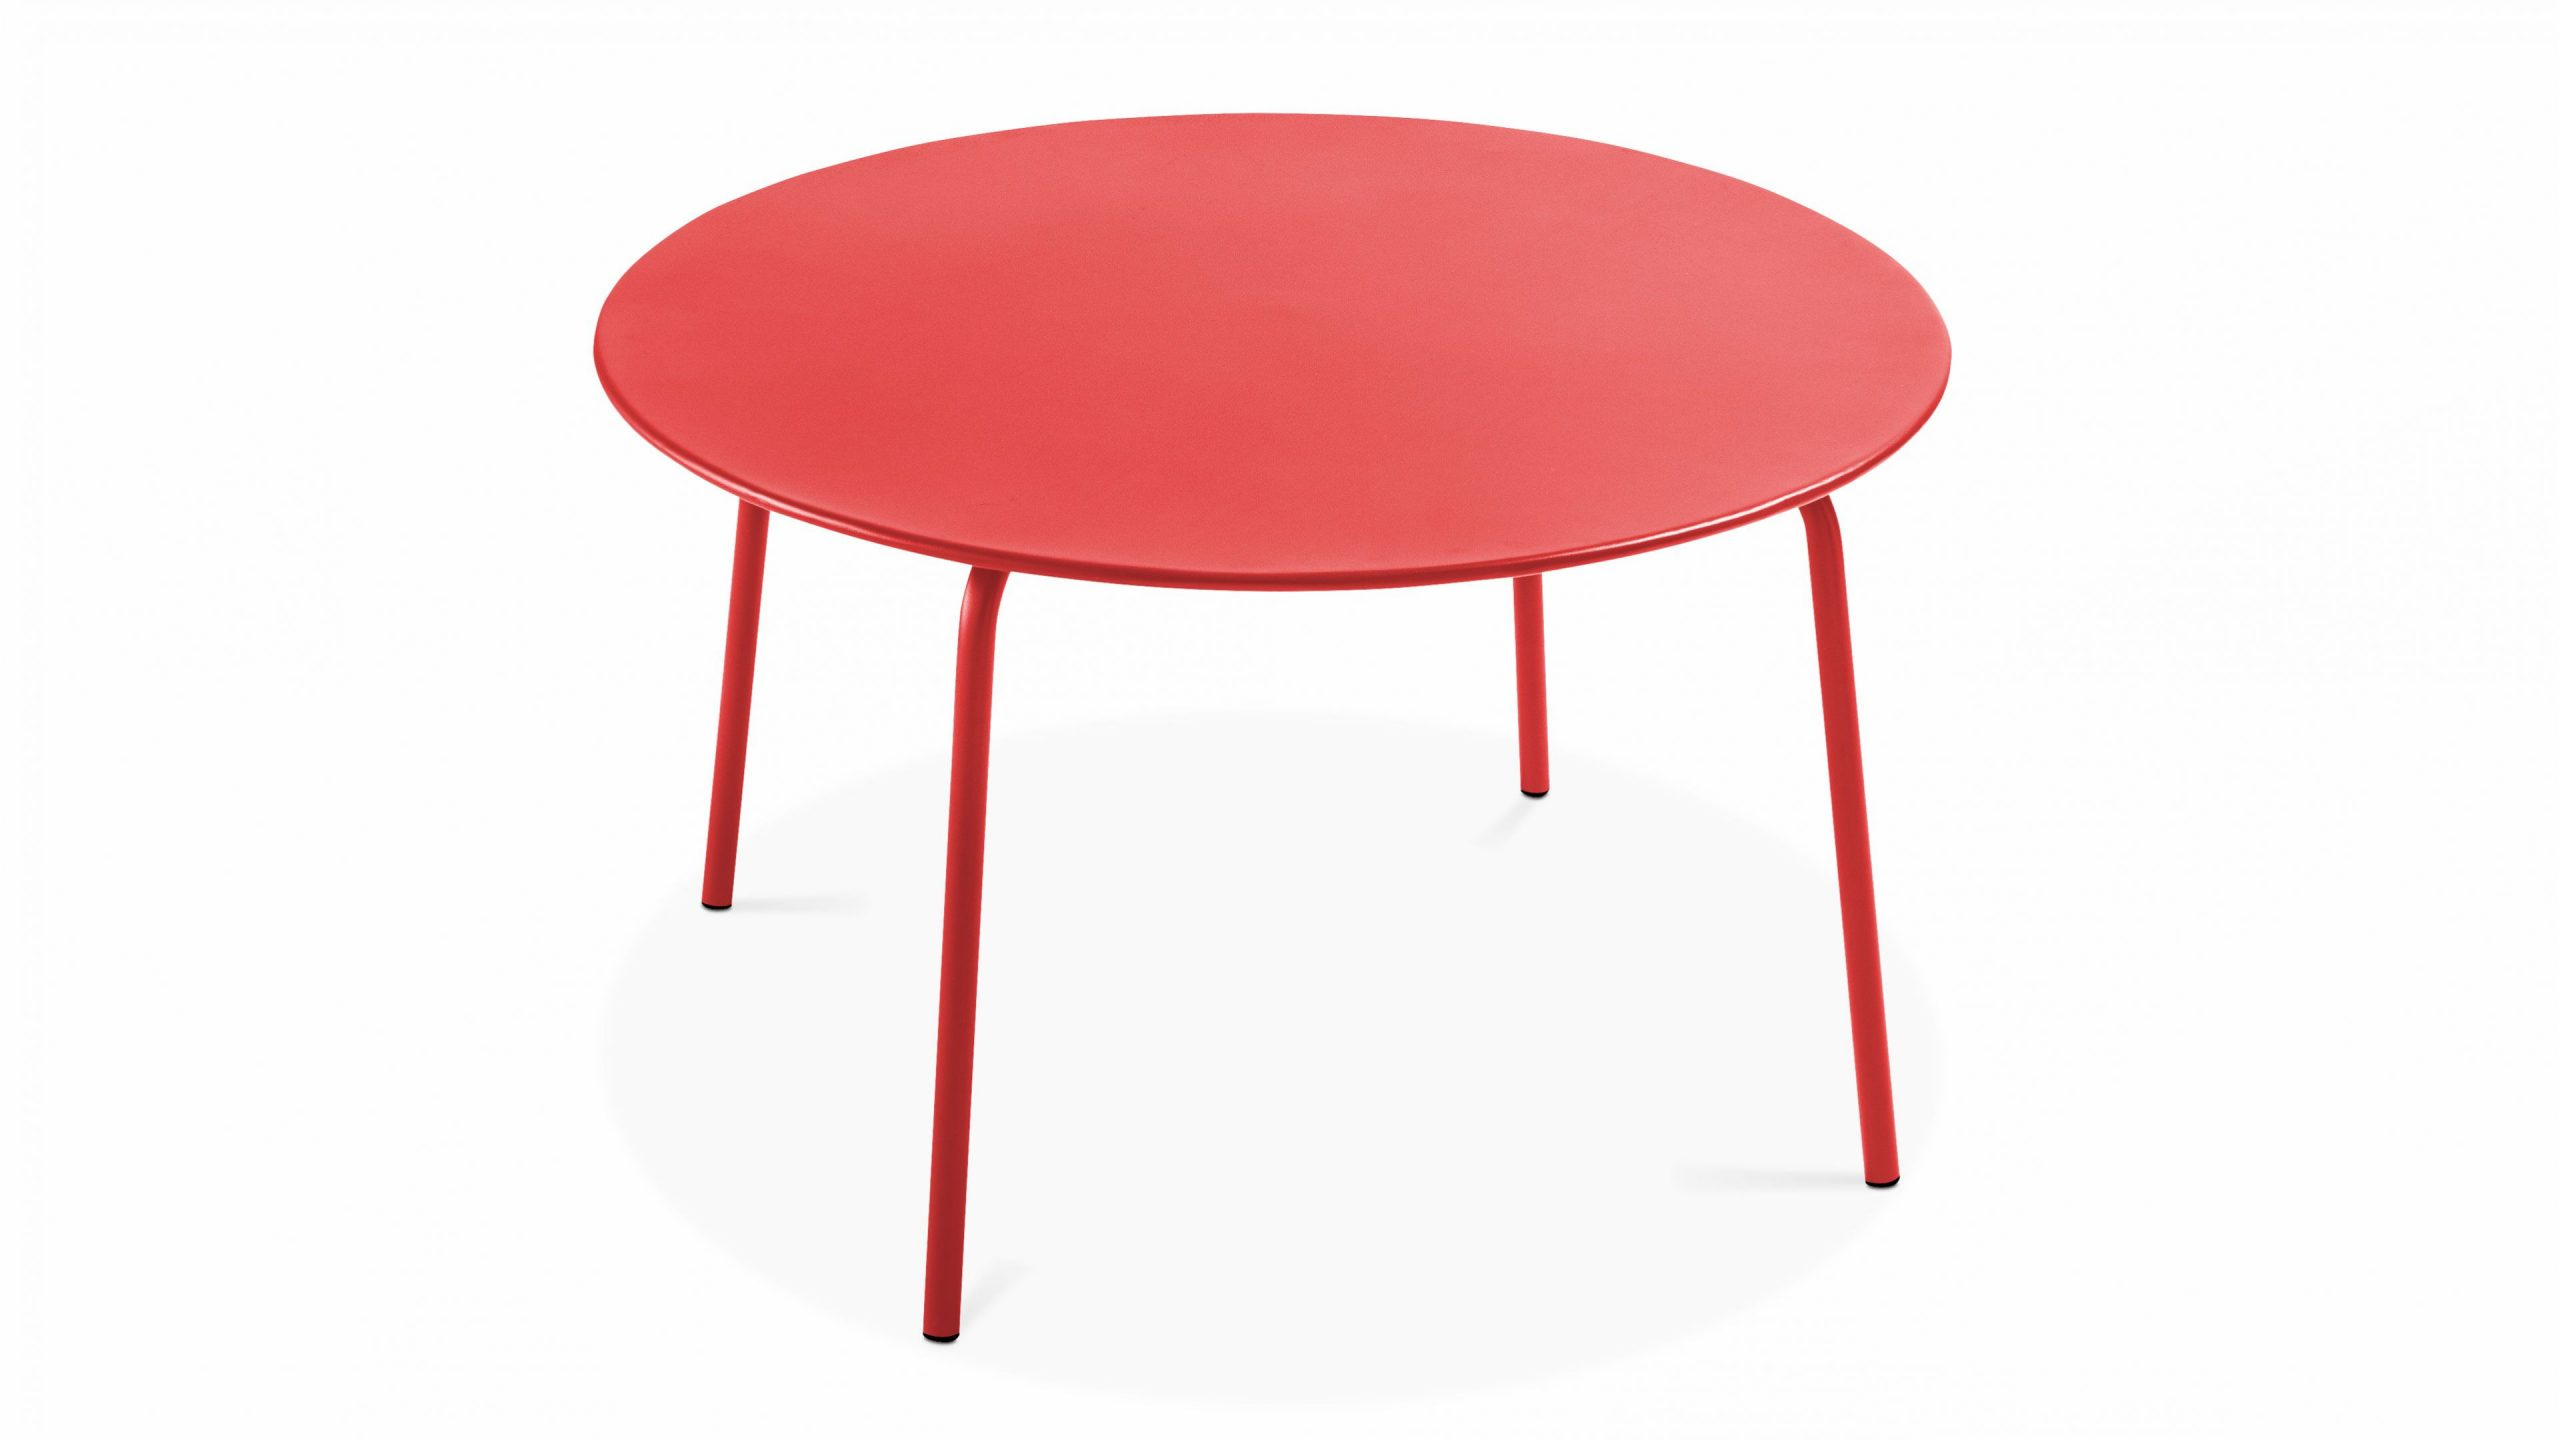 Table Jardin Ronde Metal | Oviala concernant Table De Jardin Ronde Pas Cher